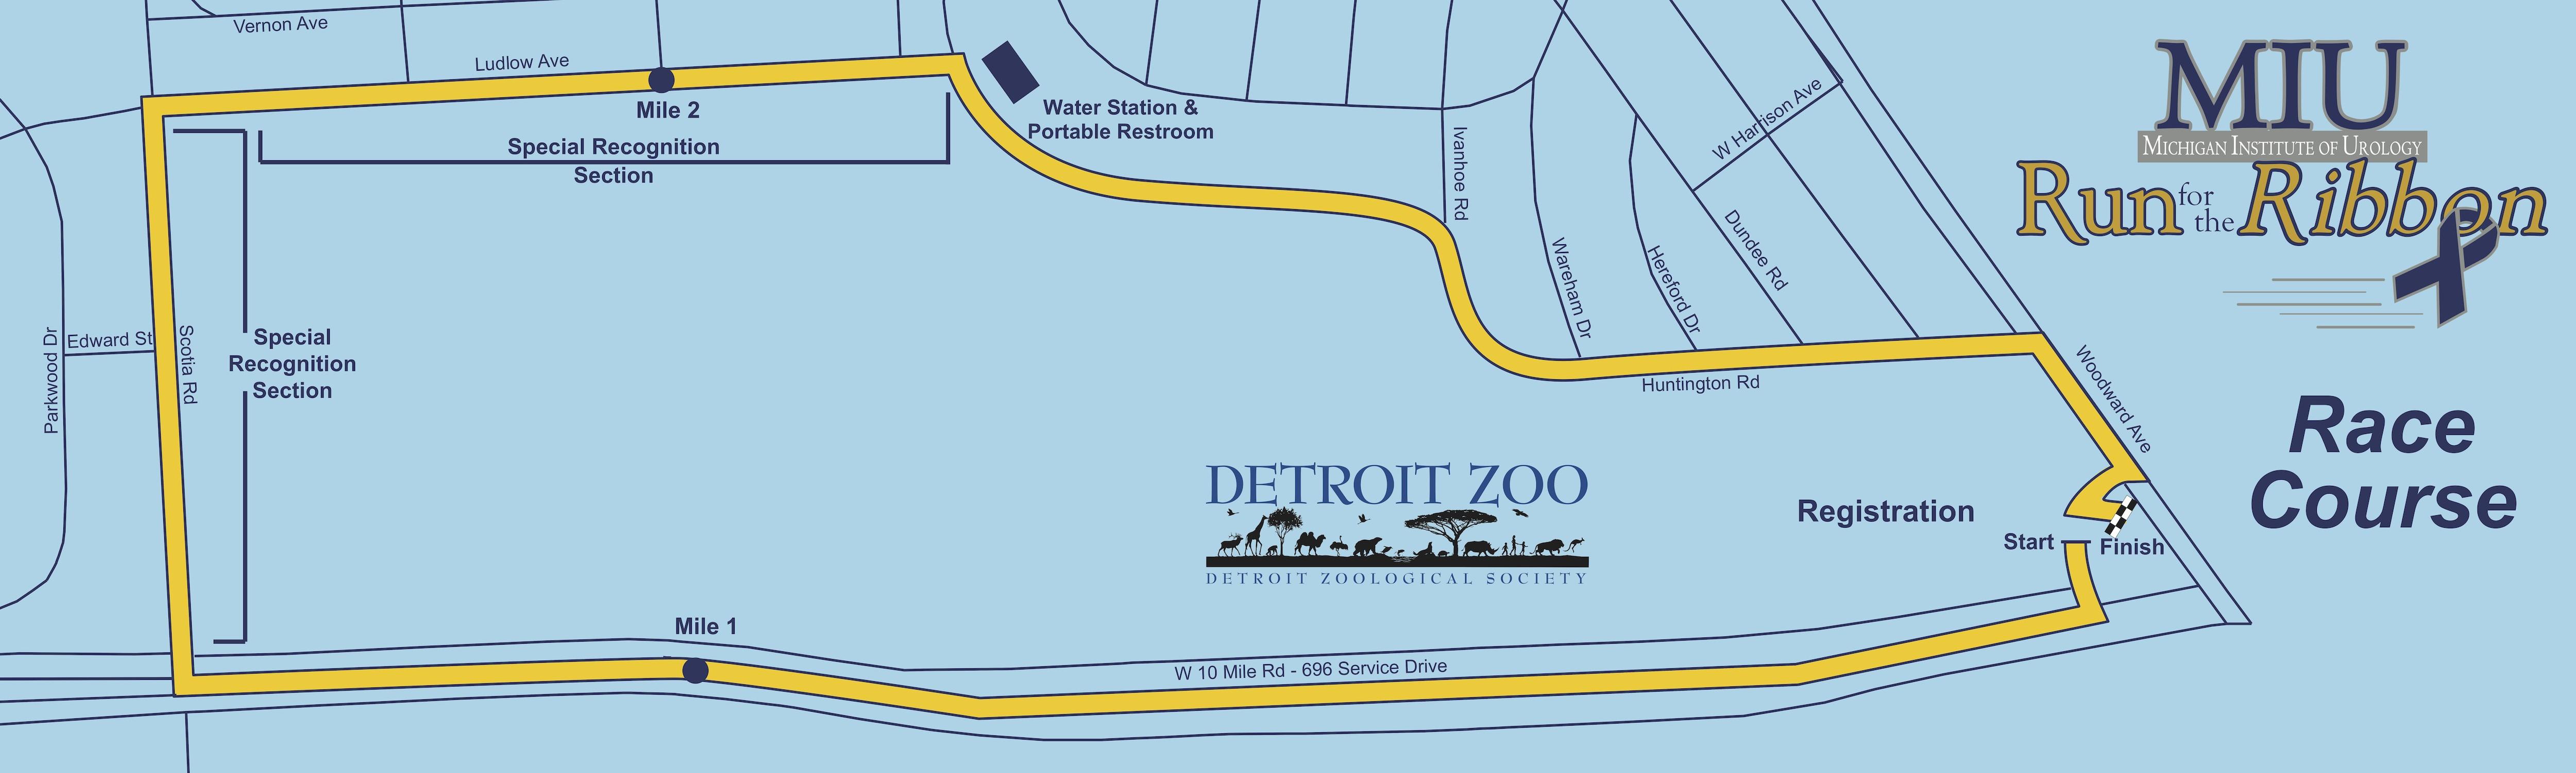 Run for the Ribbon Run/Walk Detroit Zoo Map on